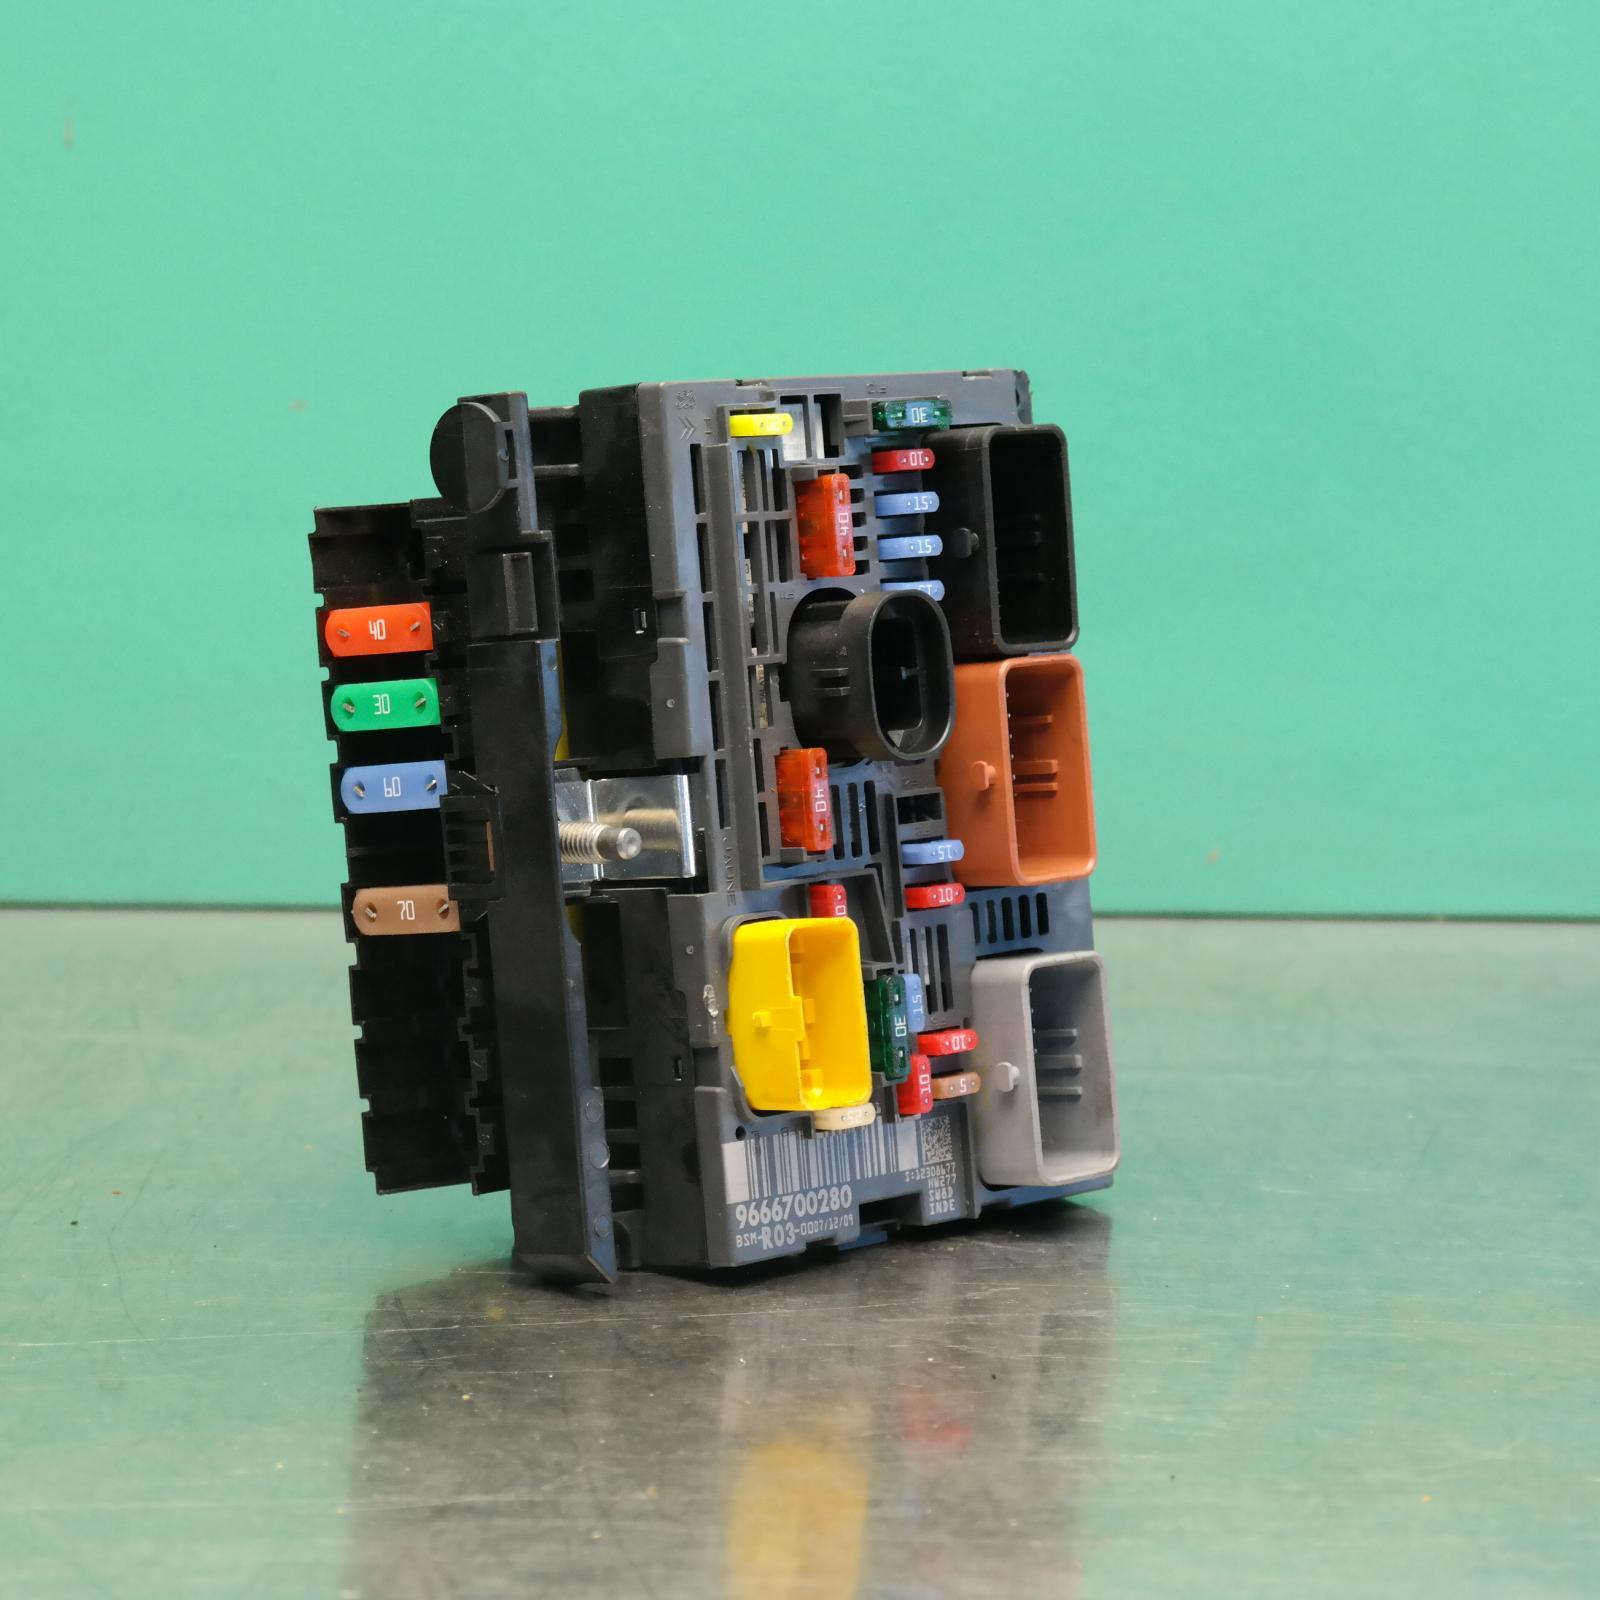 image is loading fiat-scudo-fuse-box-e5212-p-n-966-670-